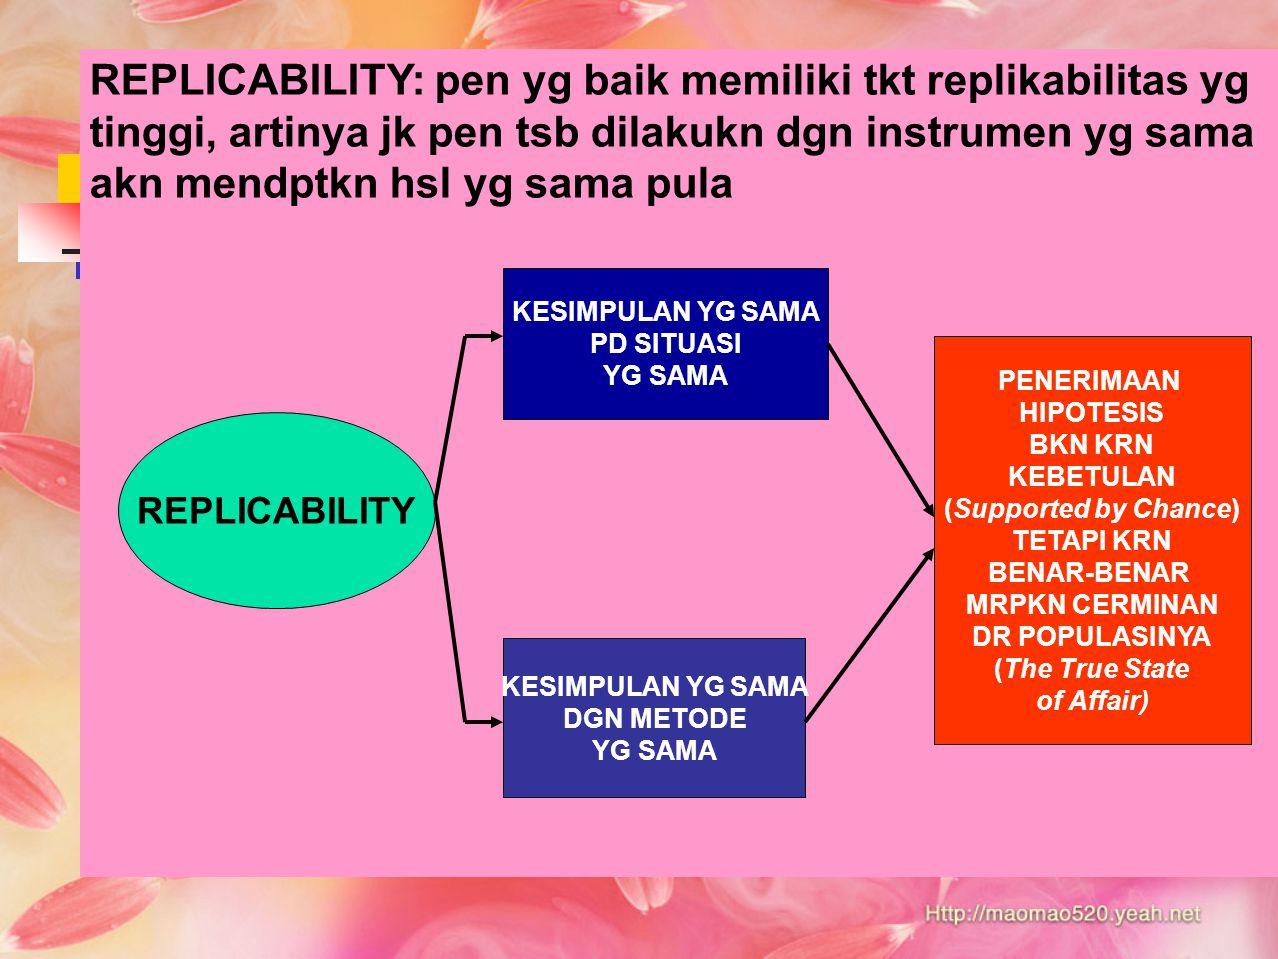 REPLICABILITY: pen yg baik memiliki tkt replikabilitas yg tinggi, artinya jk pen tsb dilakukn dgn instrumen yg sama akn mendptkn hsl yg sama pula REPL